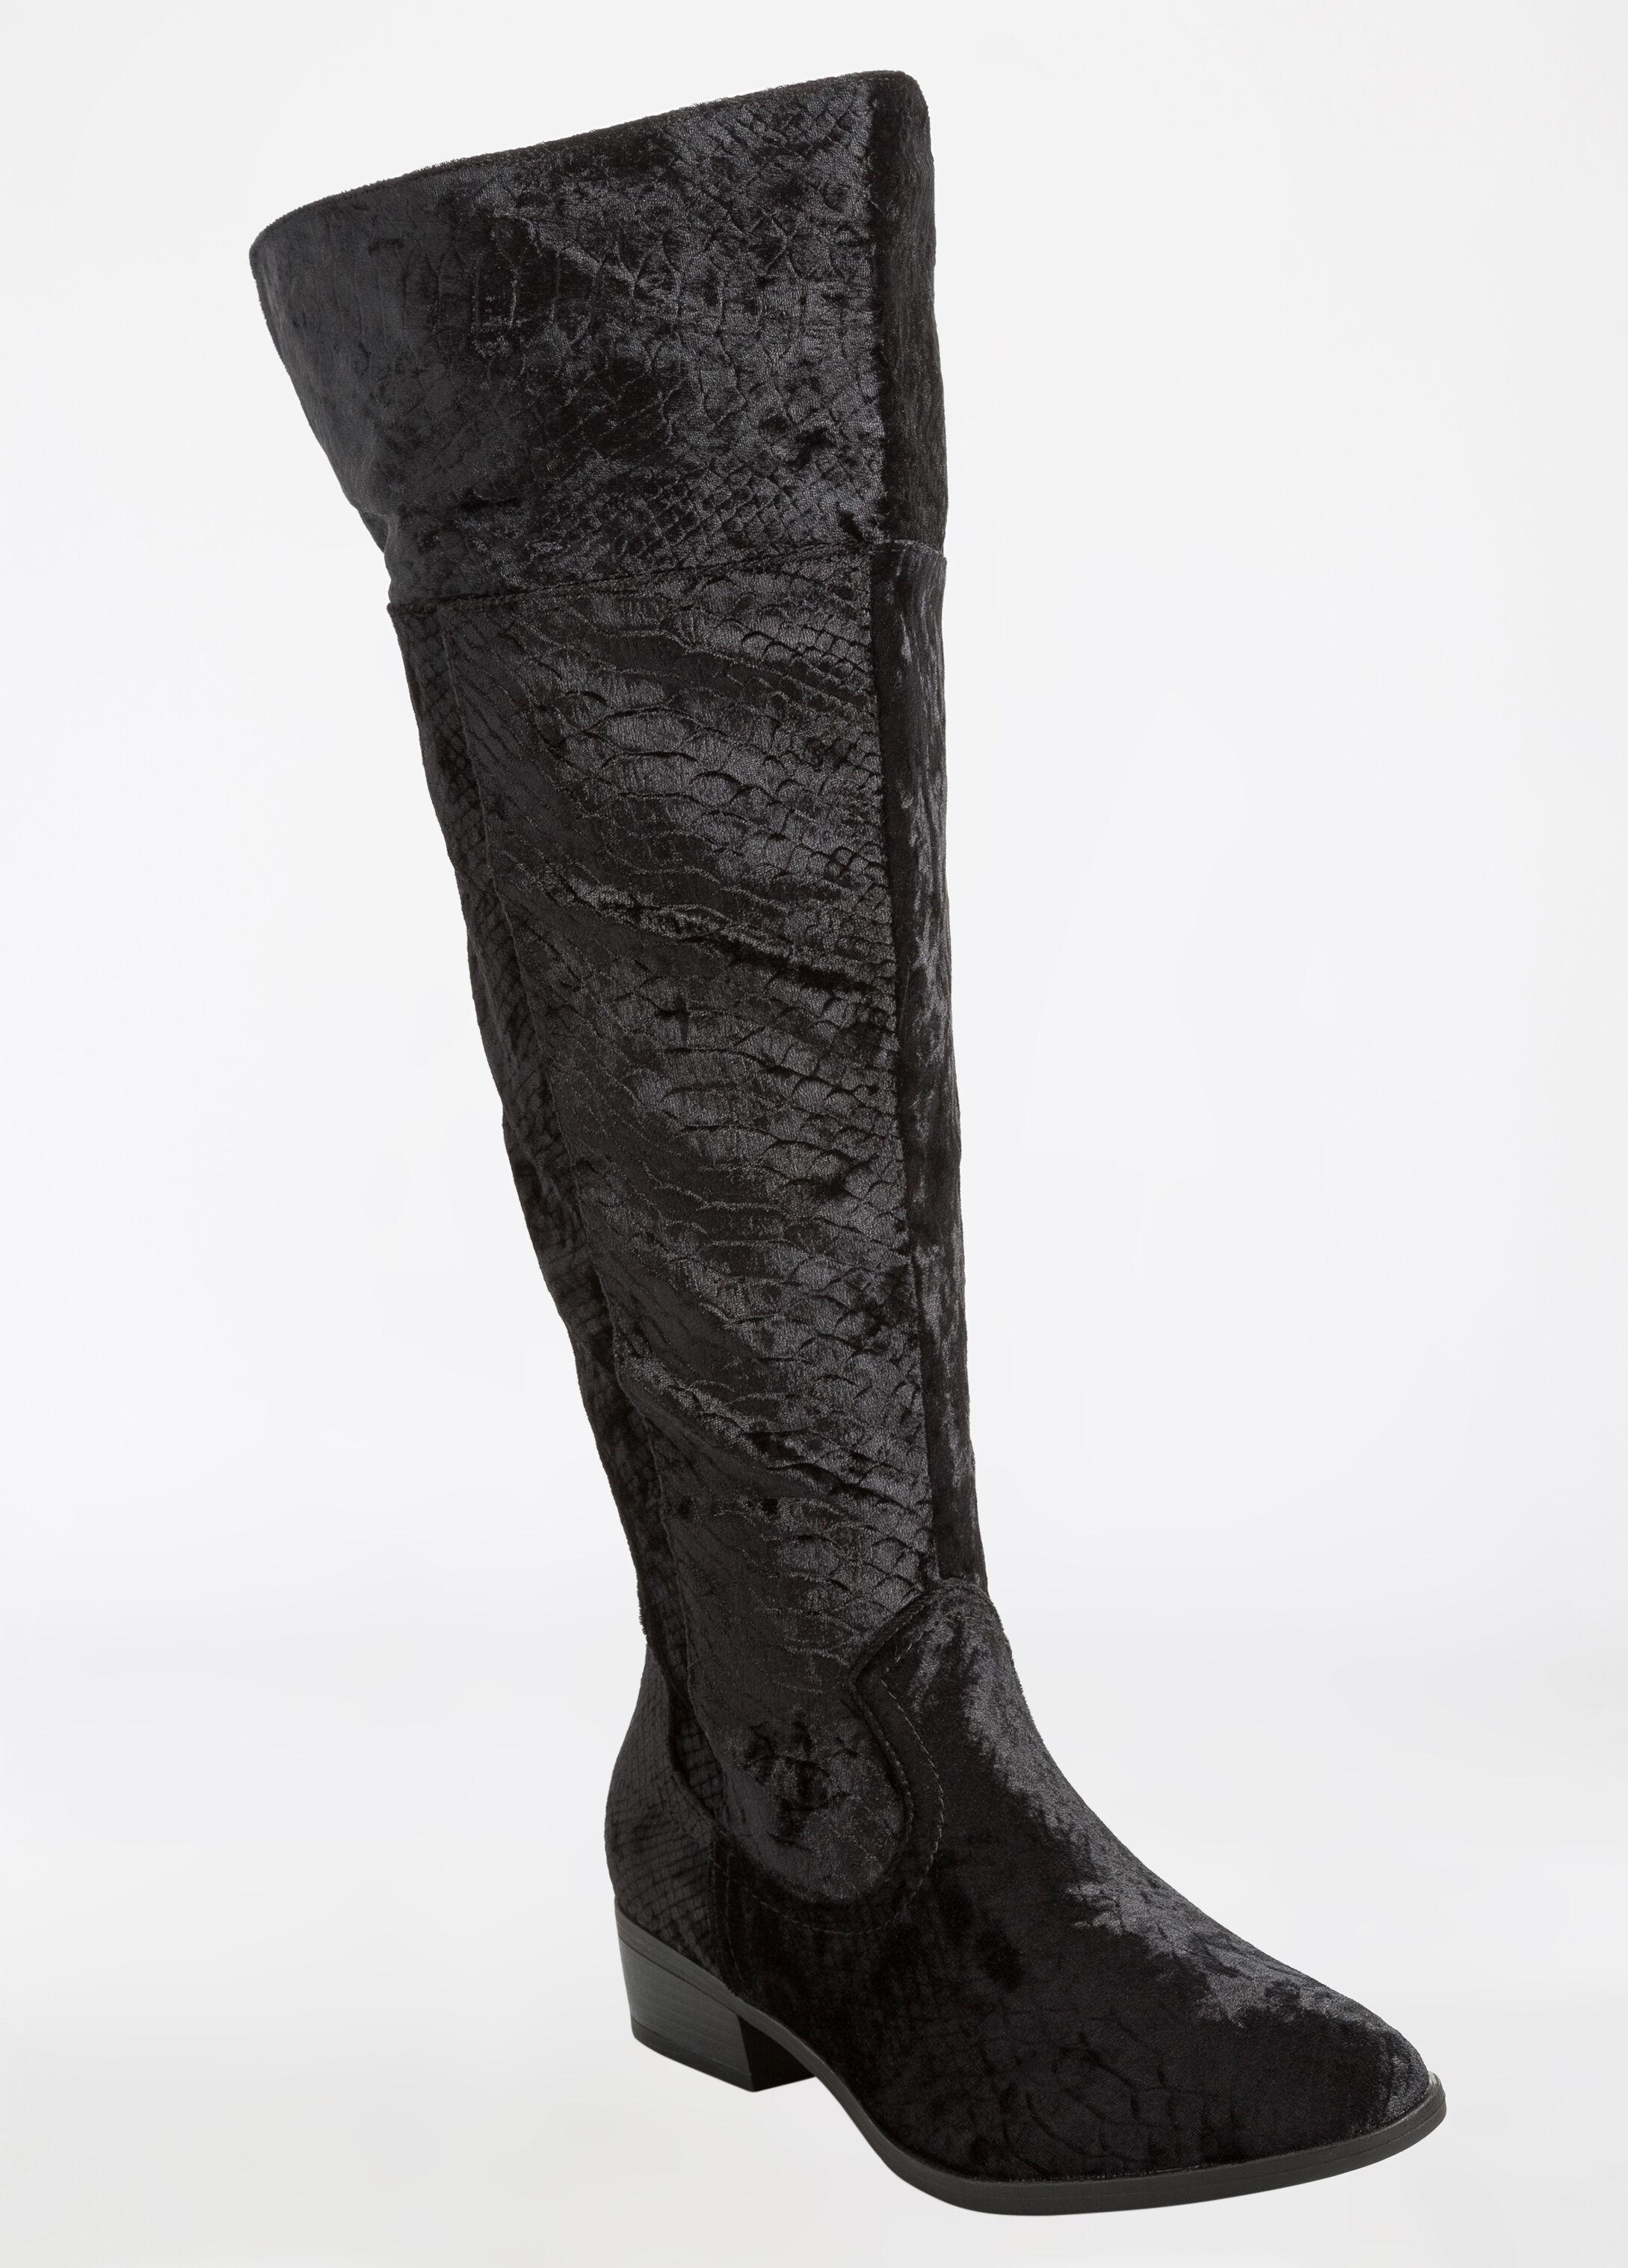 Over The Knee Crocodile Print Velvet Flat Boot - Wide Width